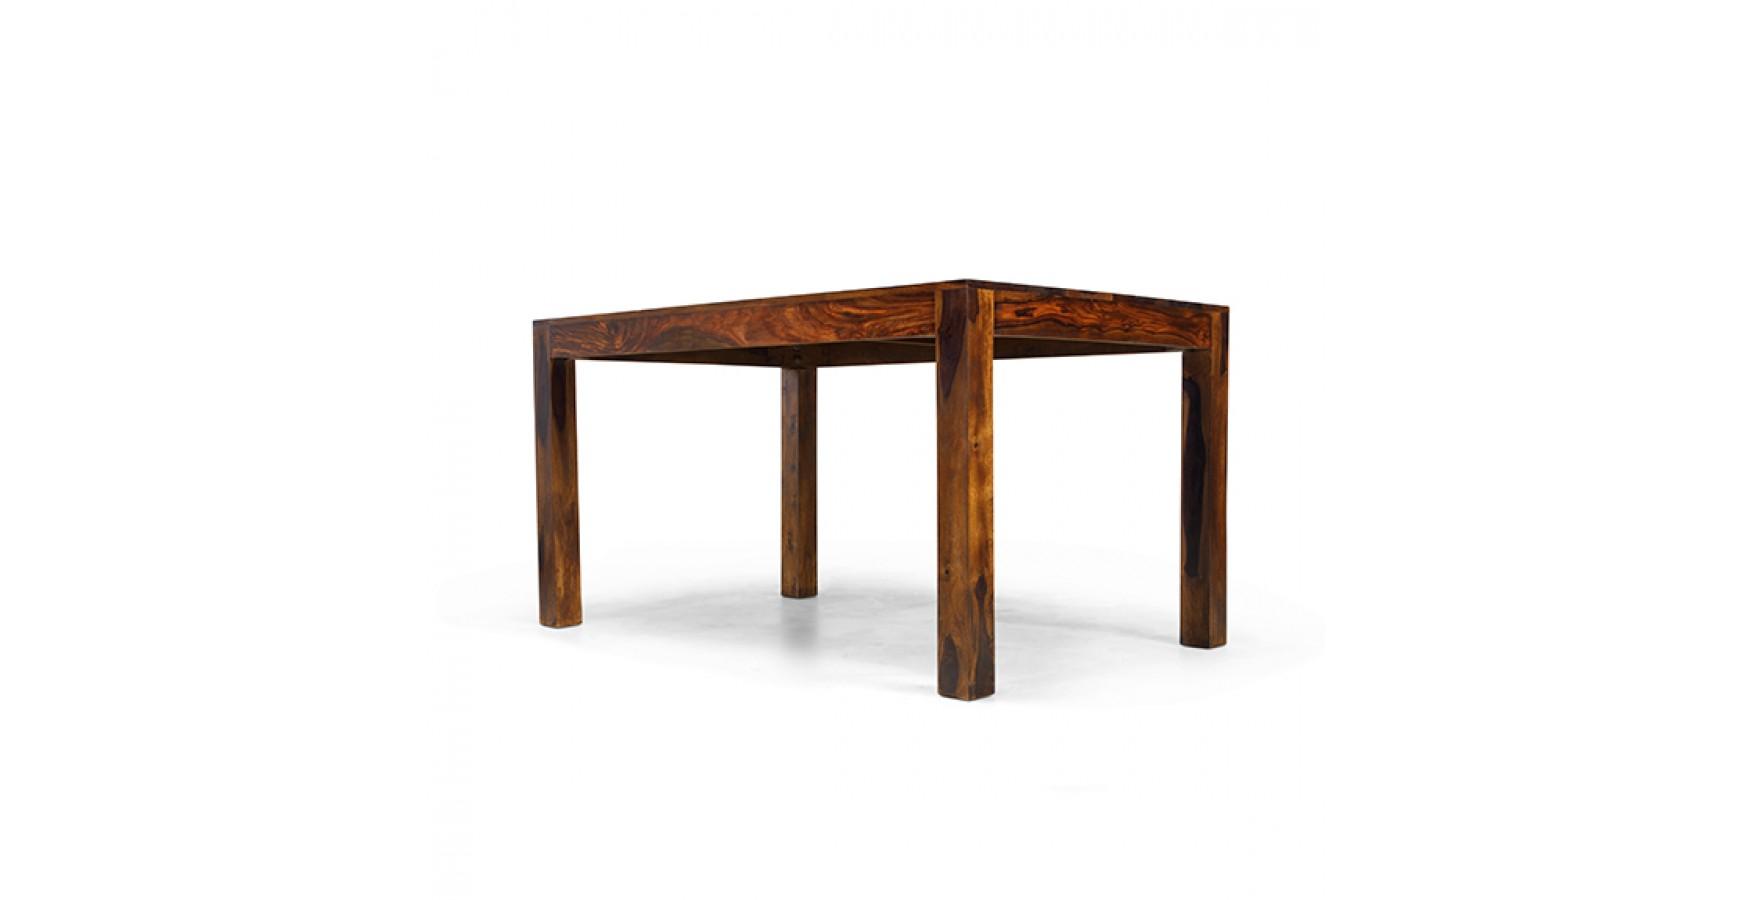 Cuba sheesham 140 cm dining table lifestyle furniture uk for Sheesham dining table